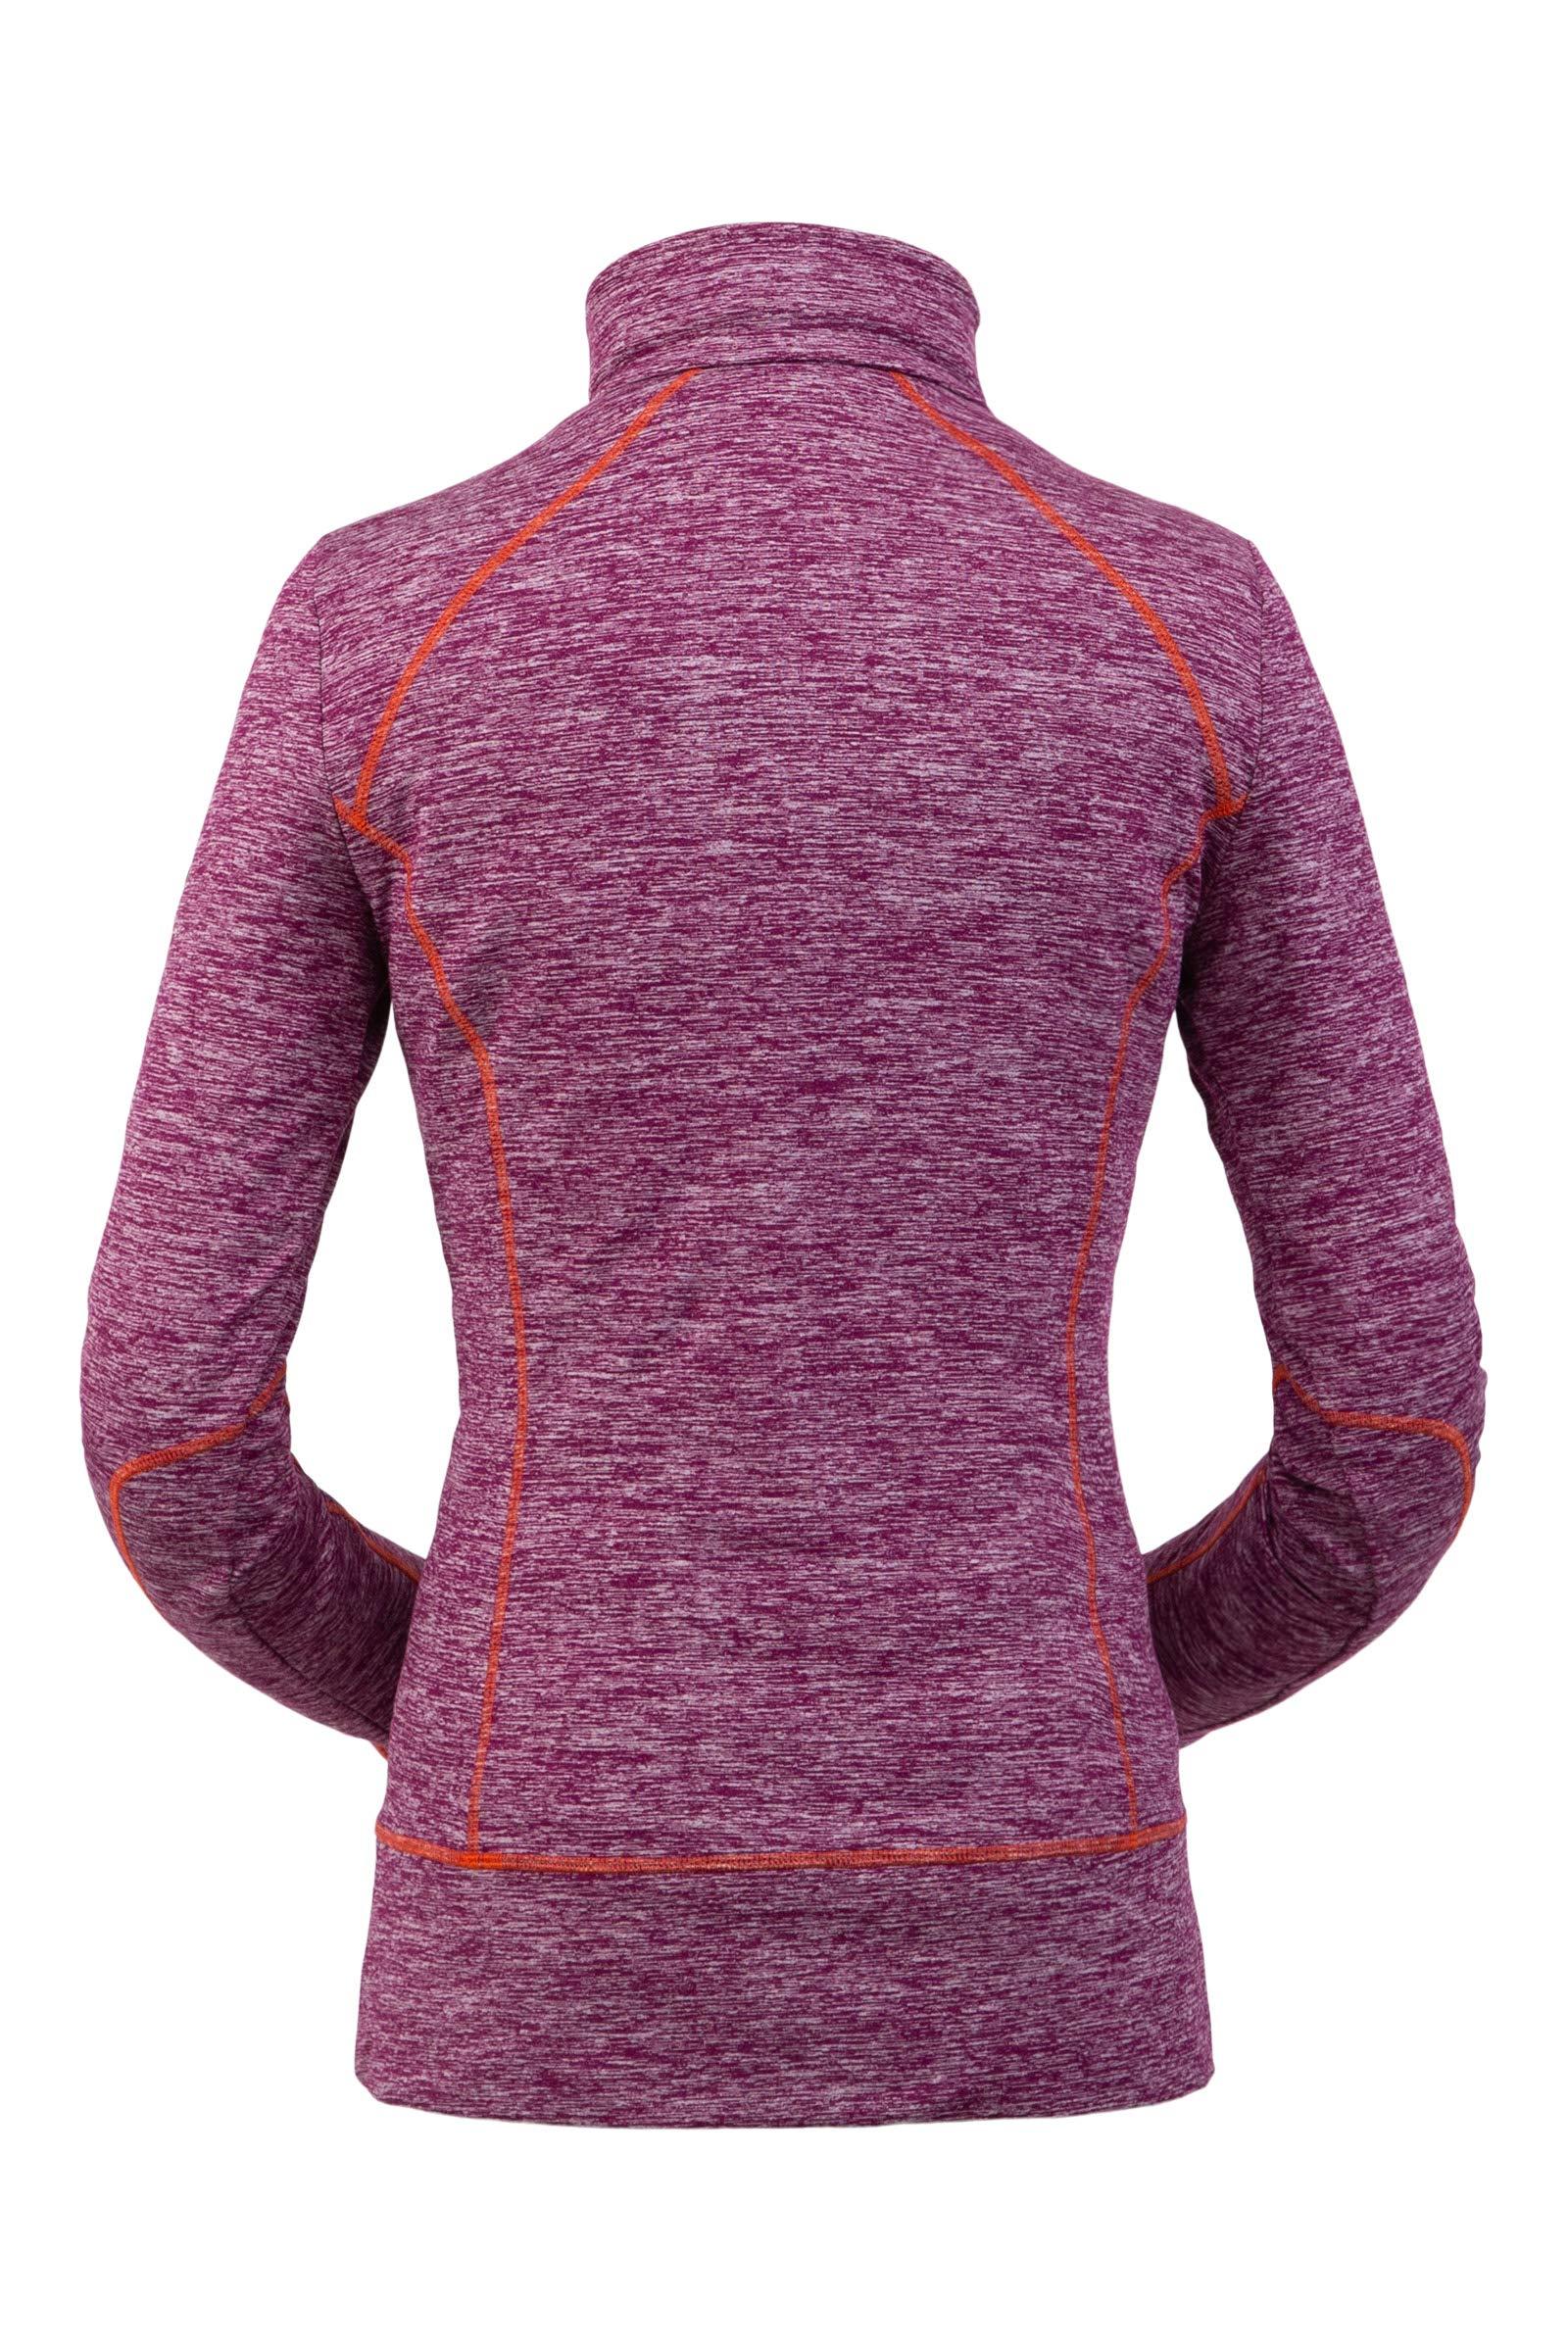 Spyder Women's Accord Zip T-Neck – Pullover Long Sleeve Active Shirt